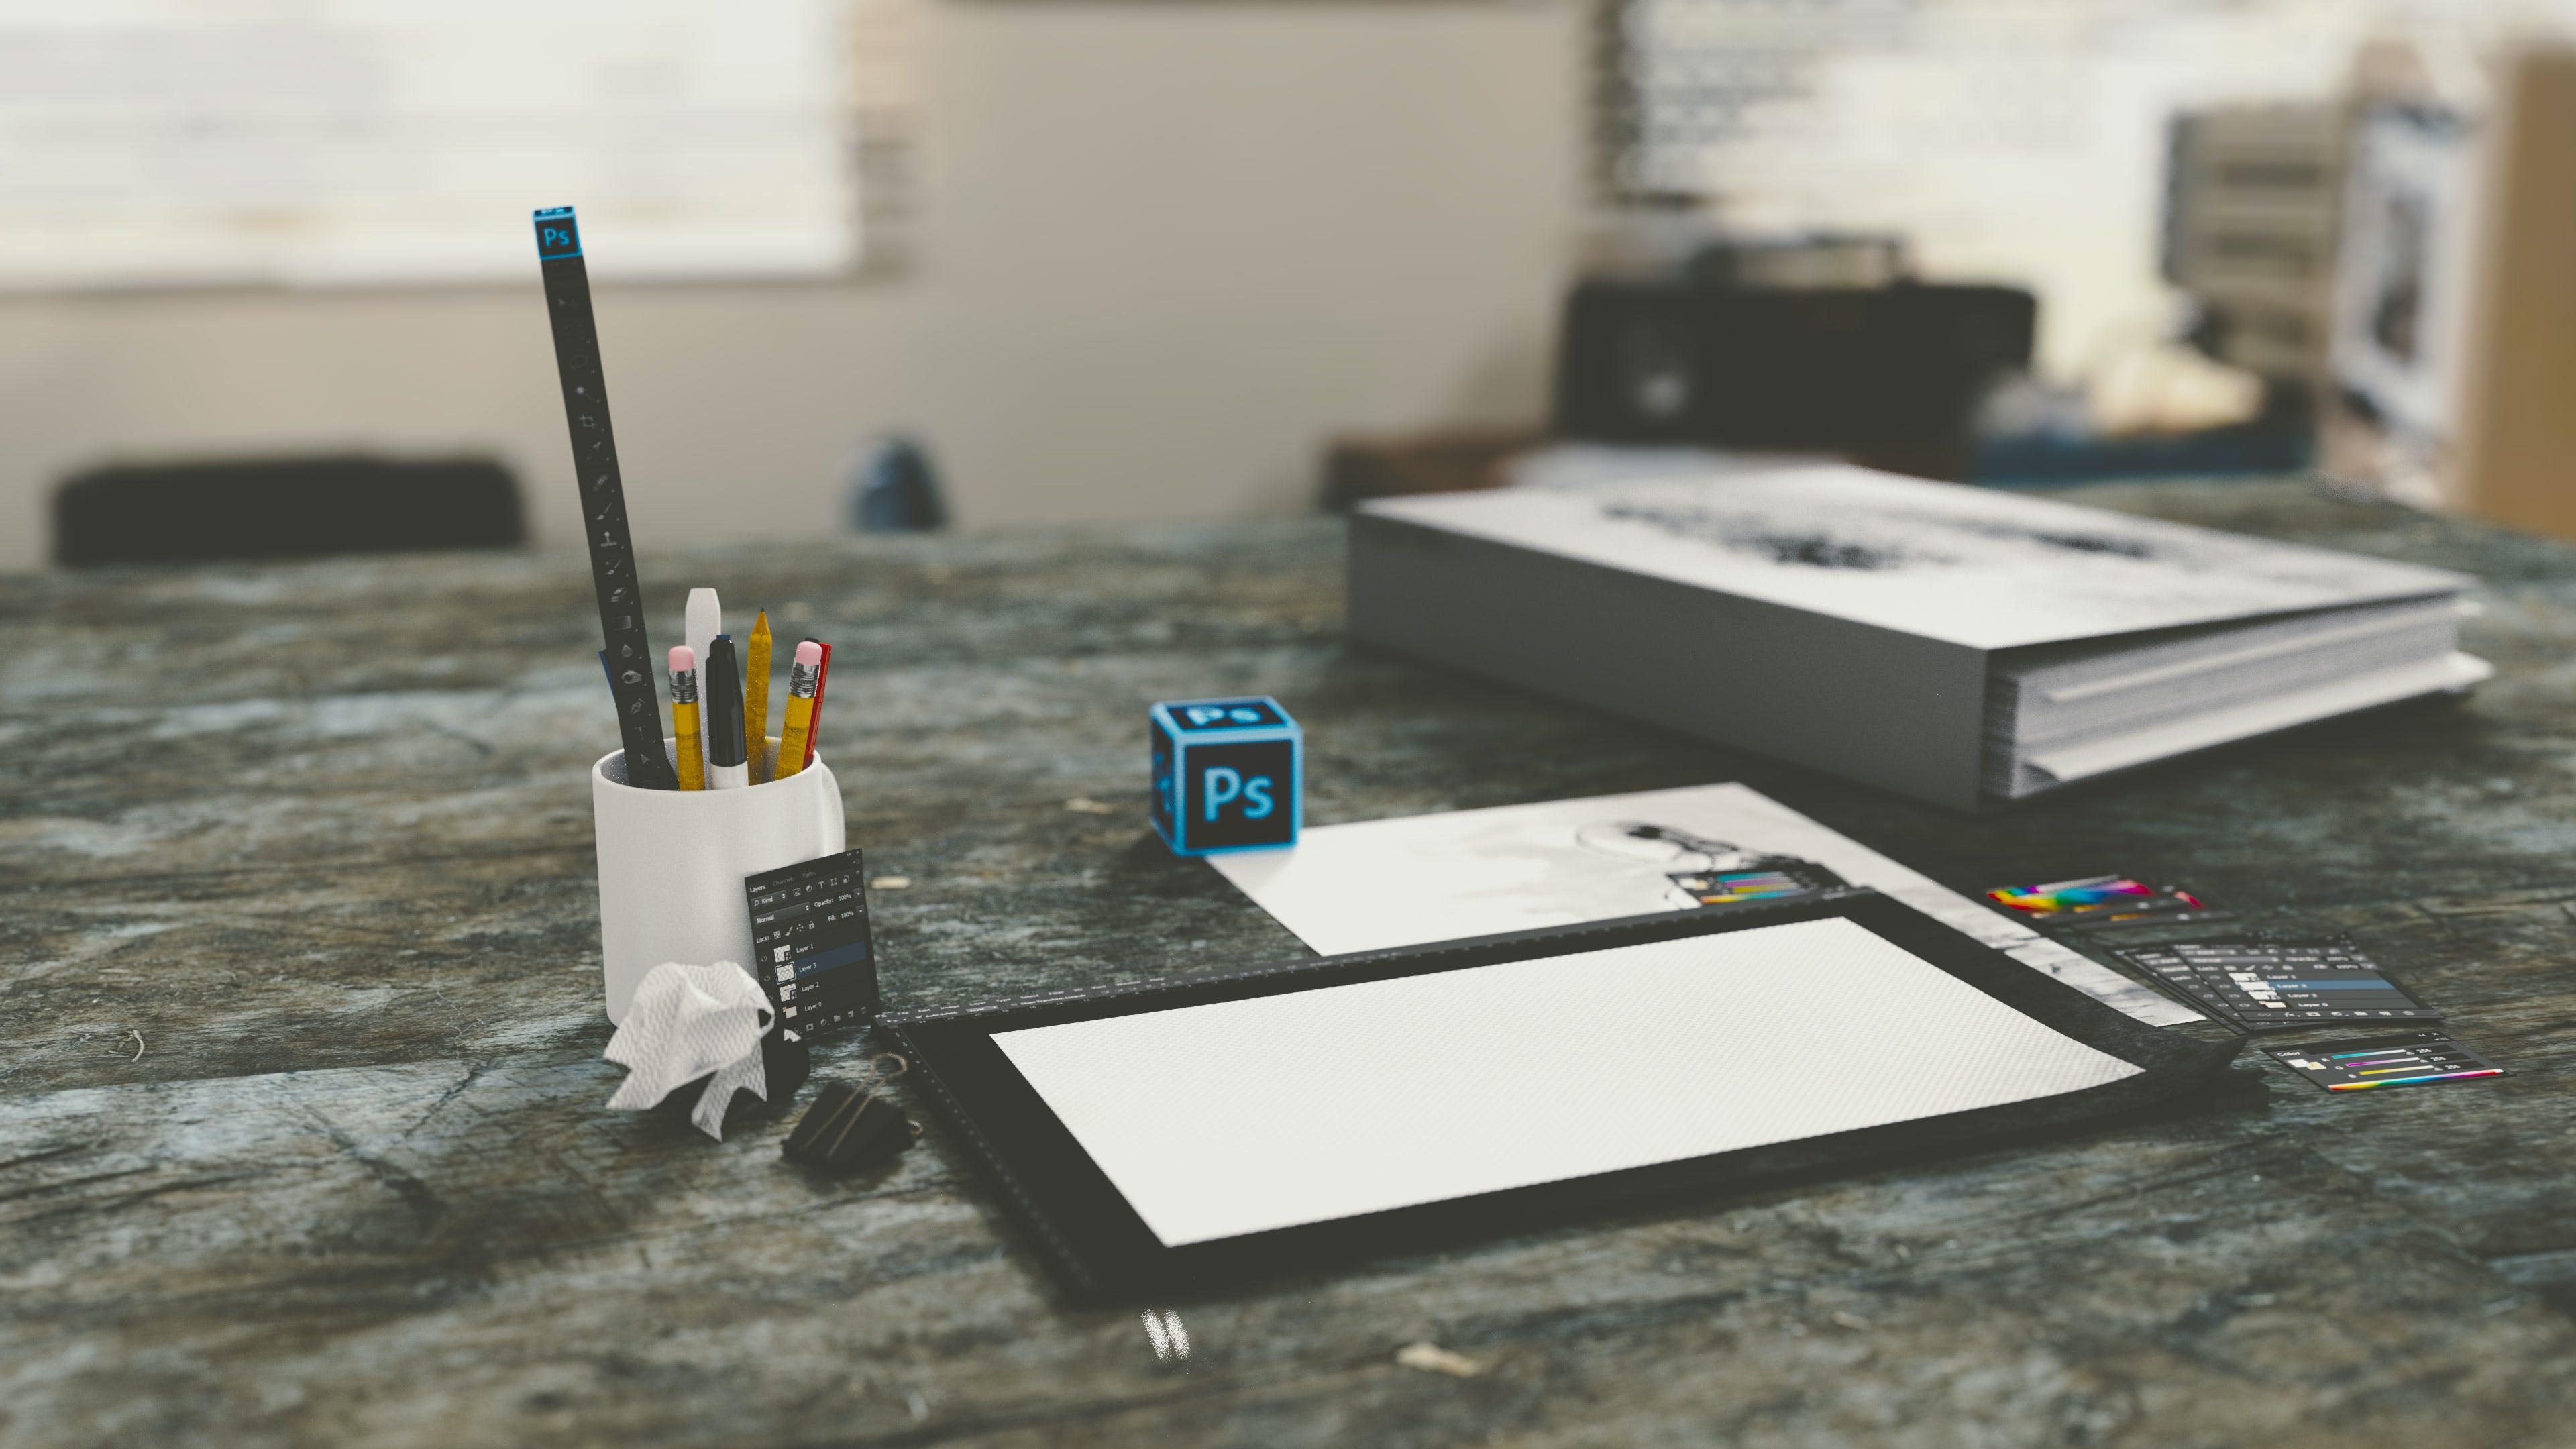 Adobe Photoshop, photoshop界面, 高清桌面 的 免费素材照片